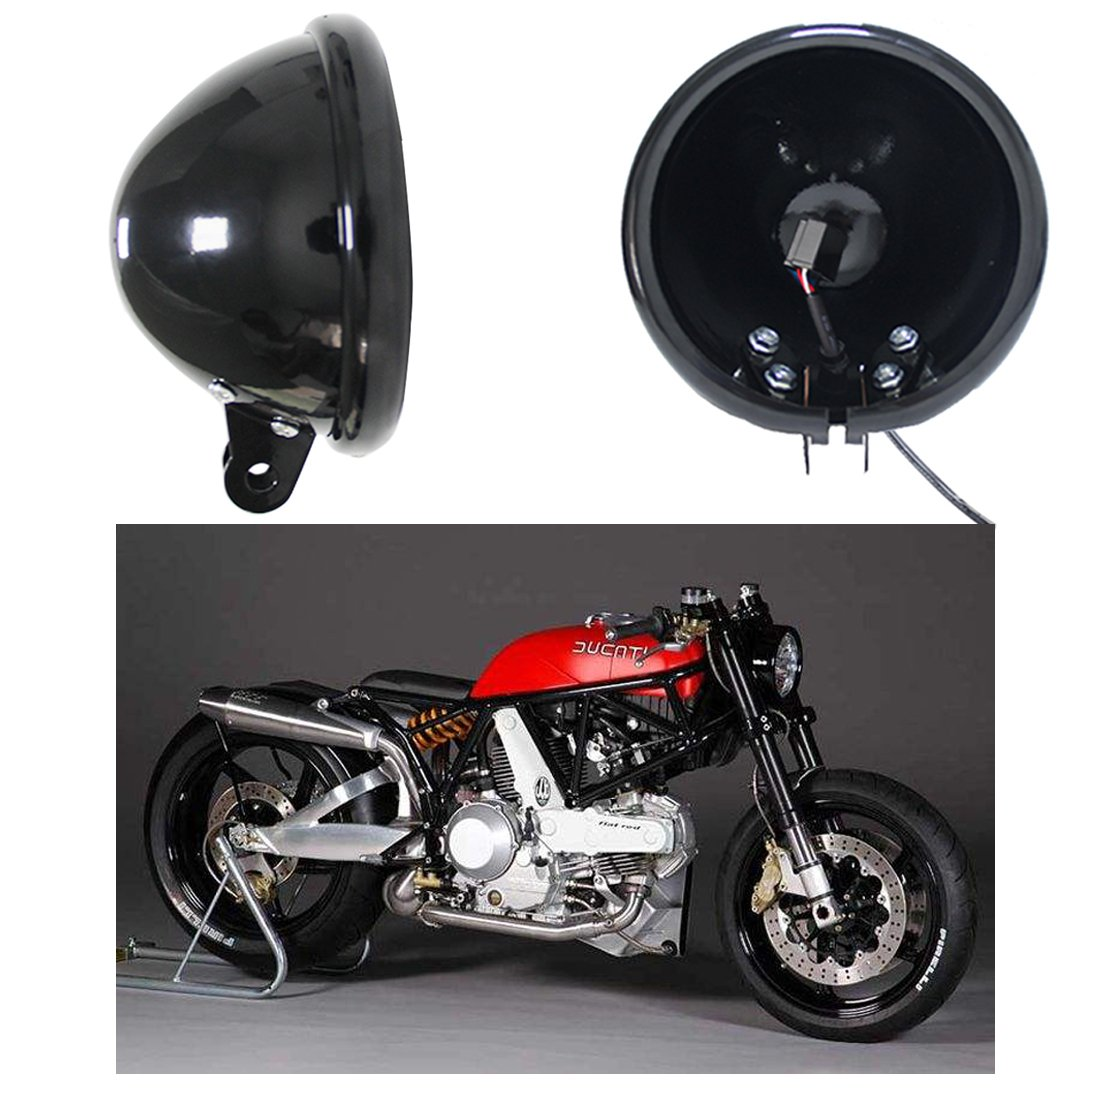 SKUNTUGUANG 5.75 Inch Motorcycle Led Headlight Housing bucket Bracket for Harley Davidson